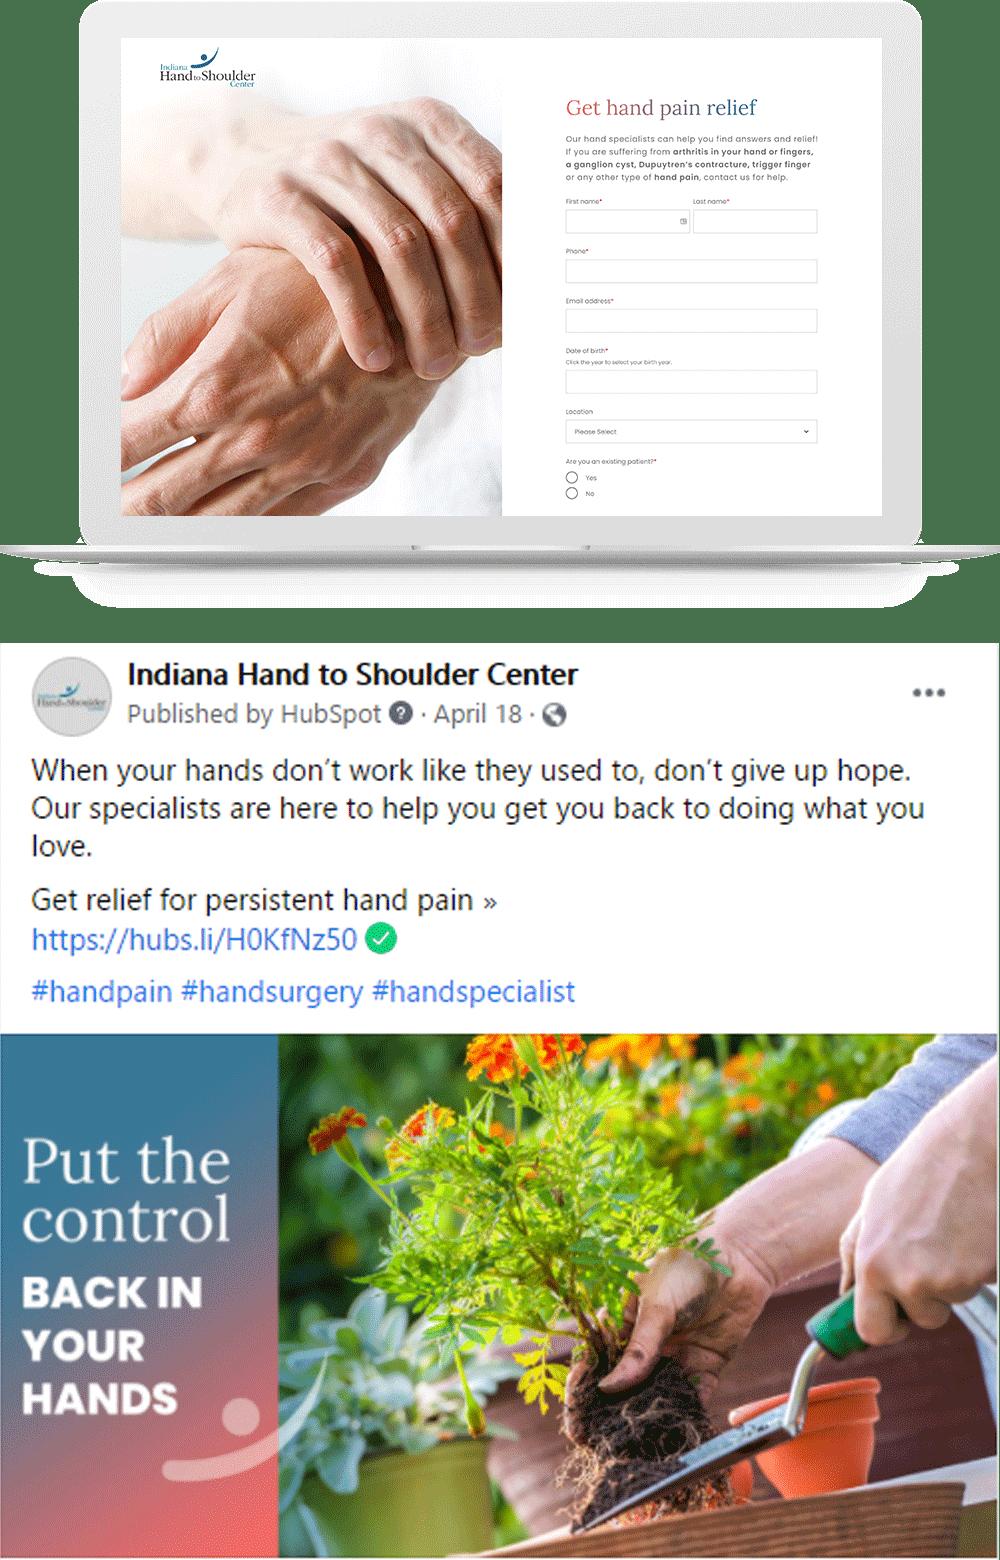 Indiana Hand to Shoulder Center Marketing Service Line Campaign Award Winner